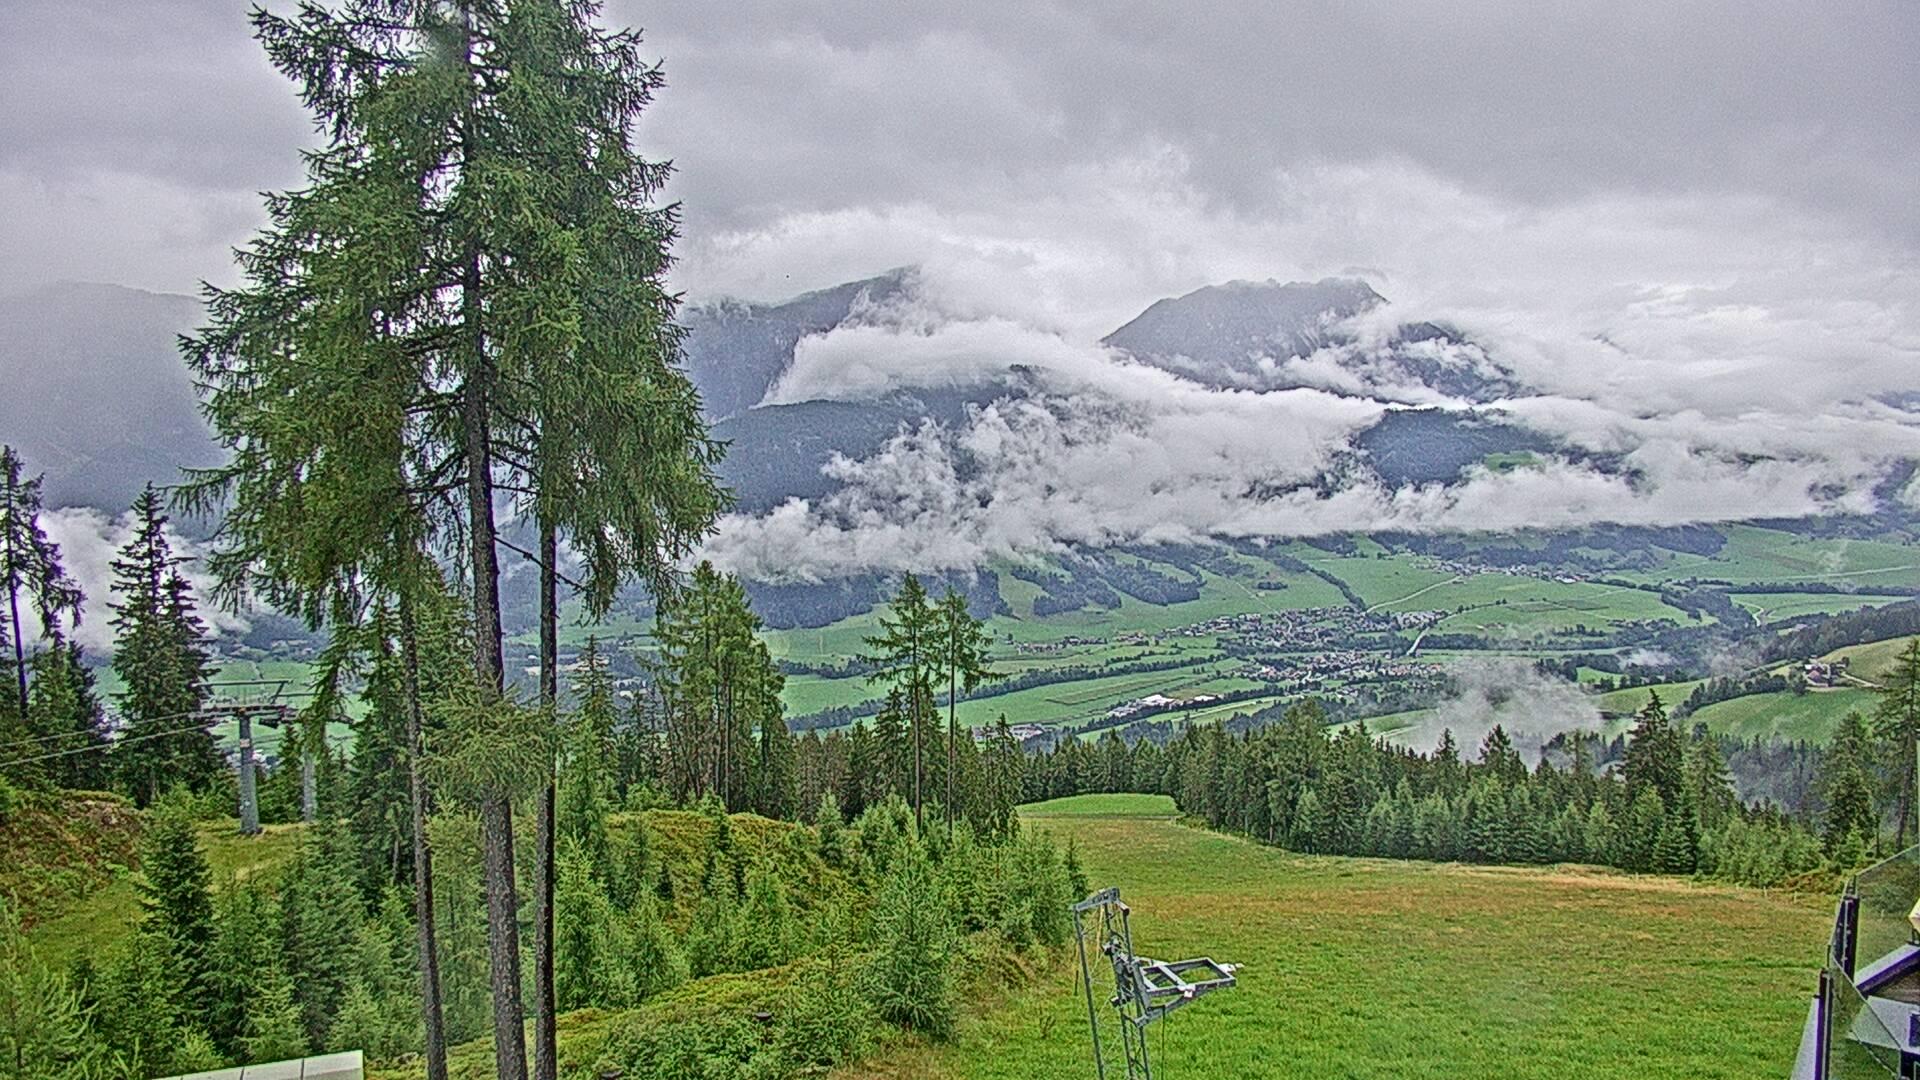 Ski haus restaurant hochstuckli webcam